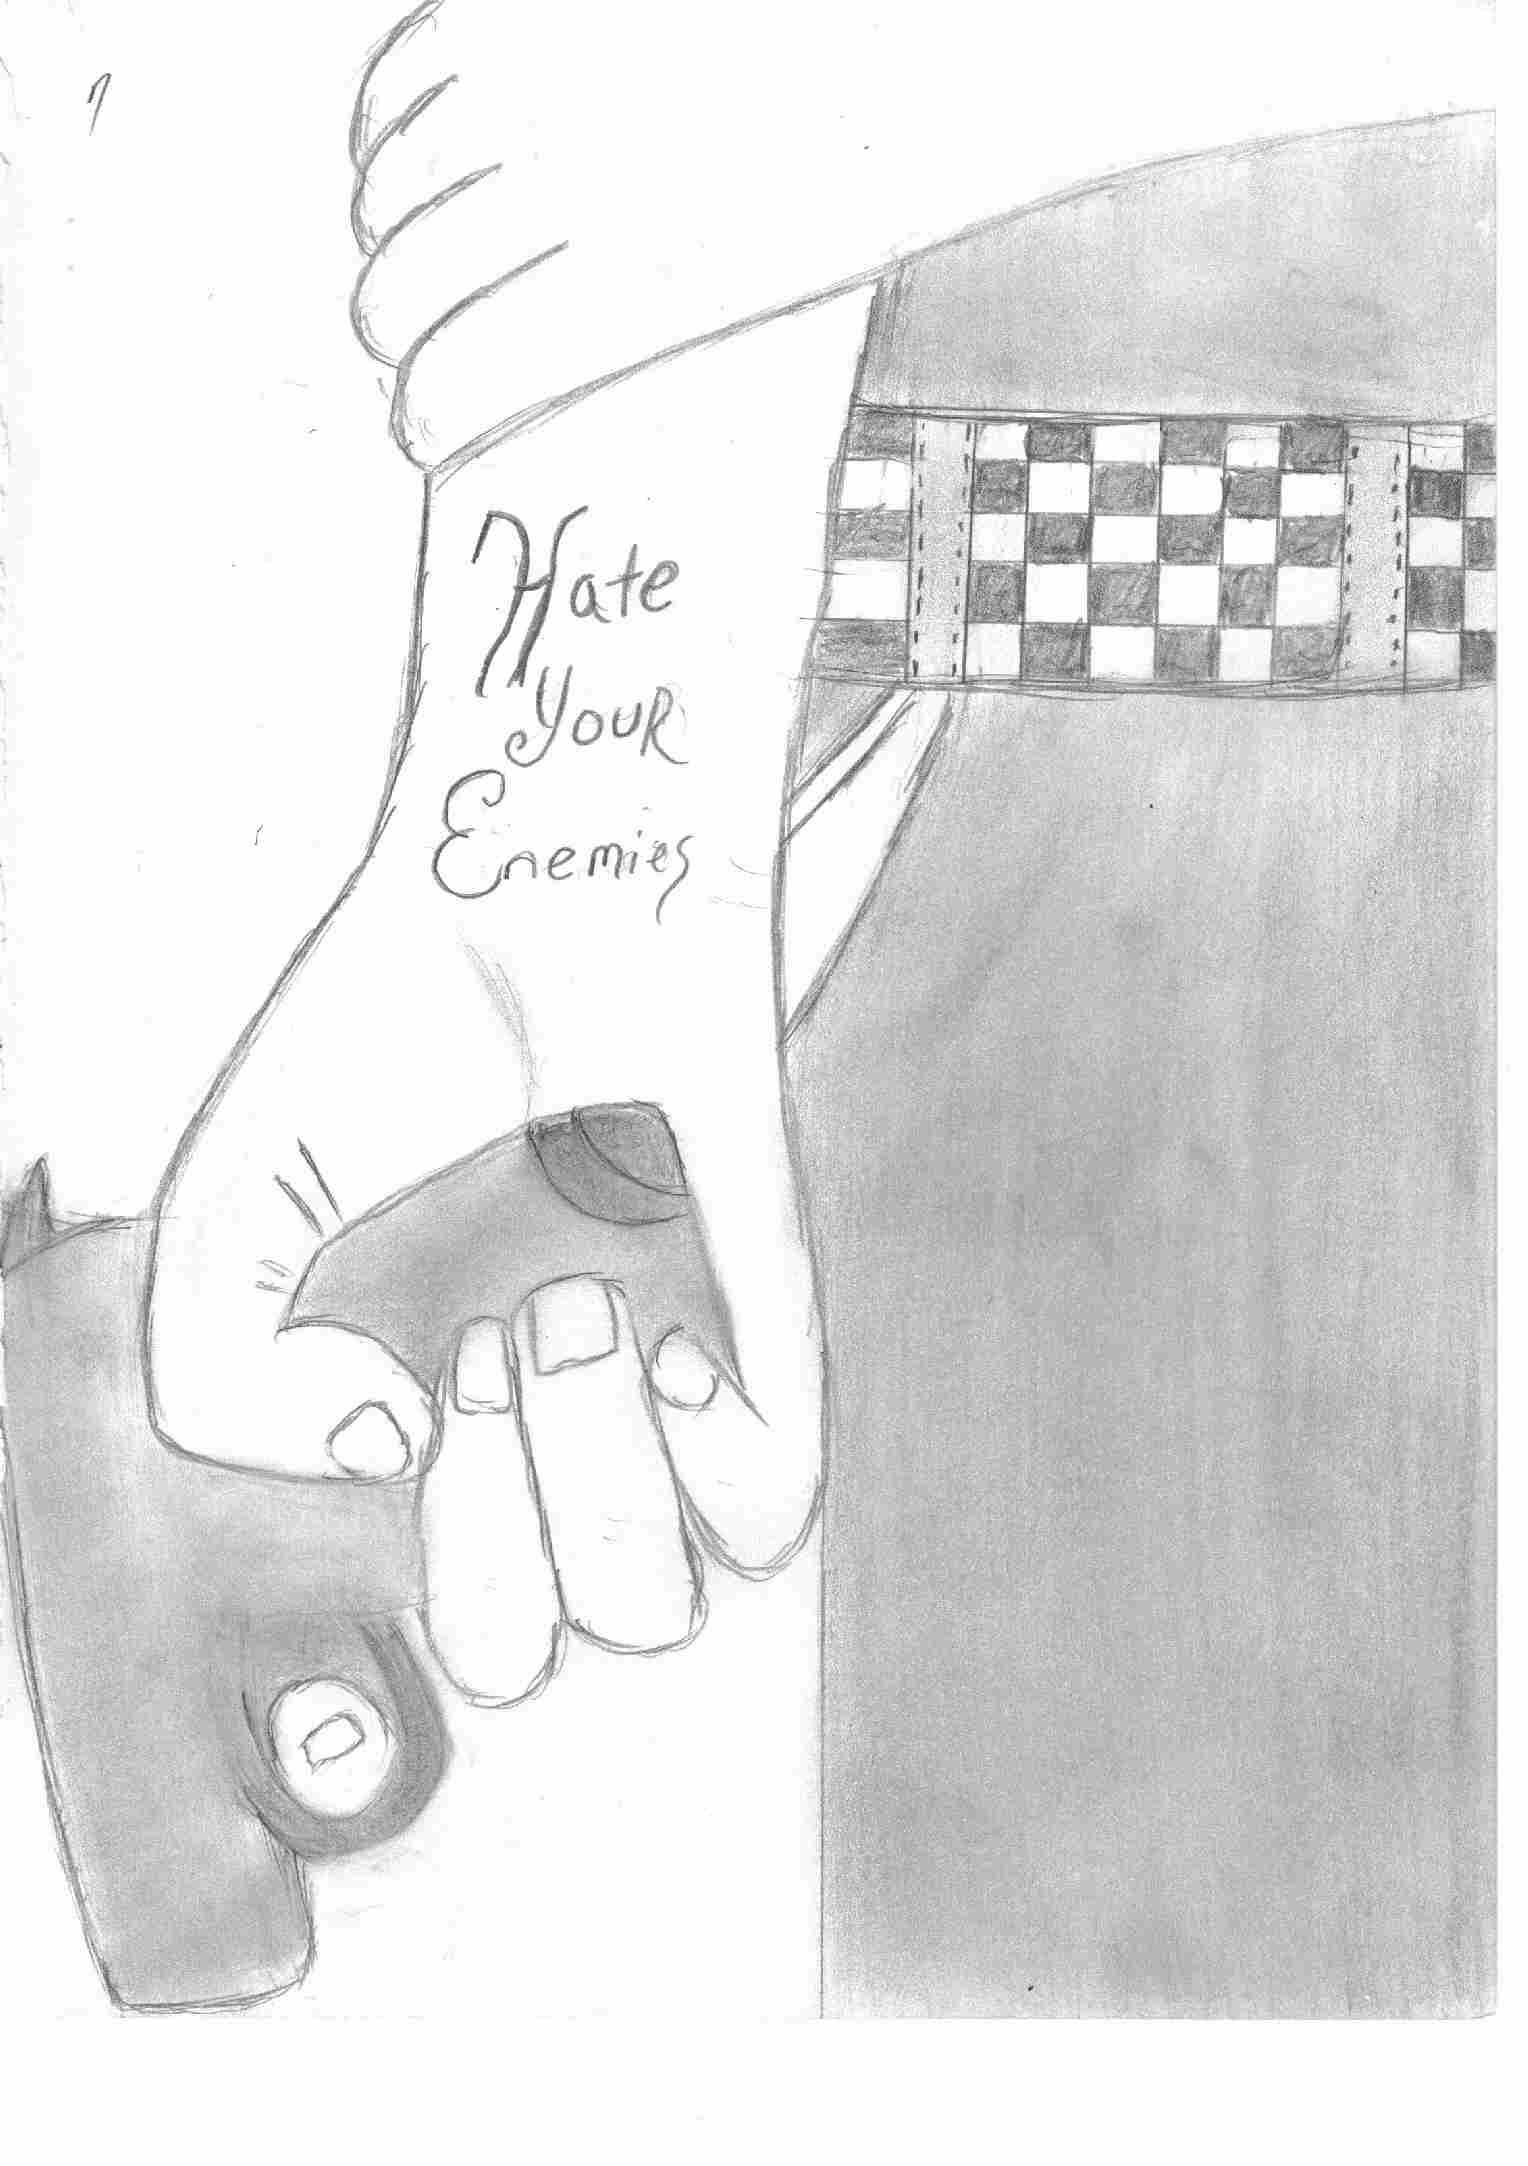 Hate your enemies